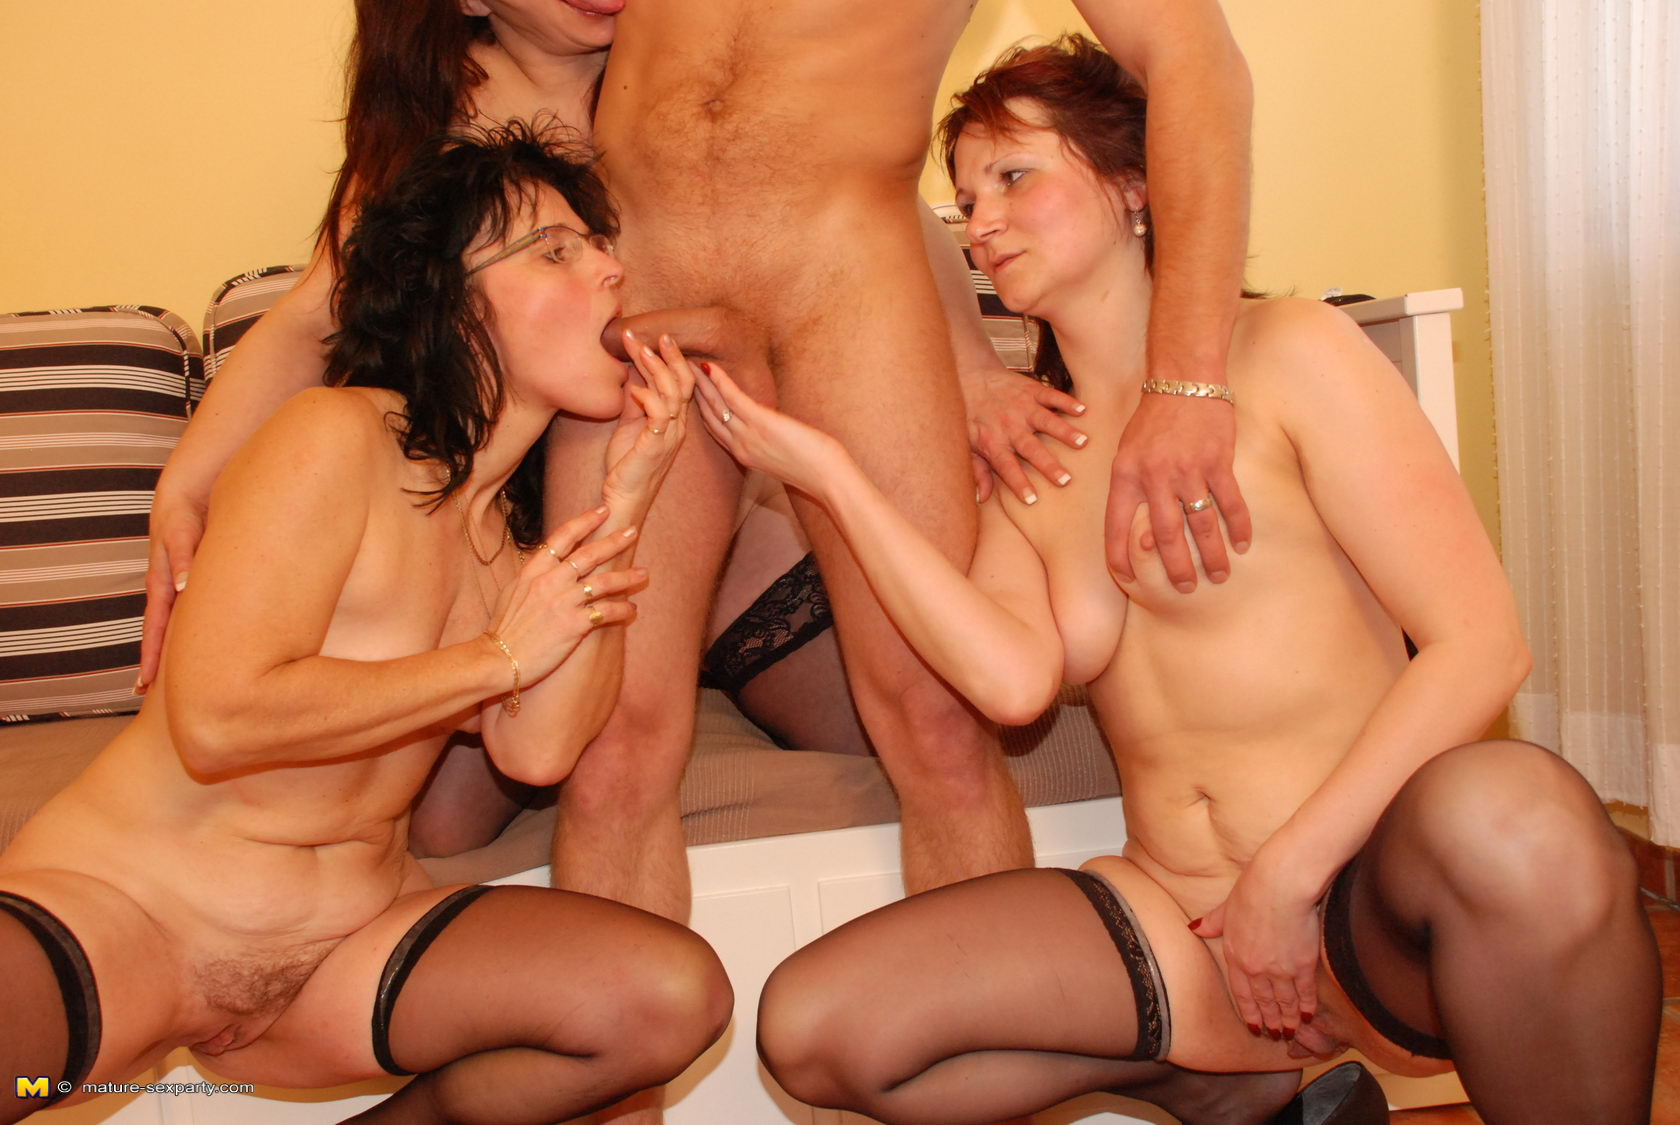 девочки порно ролики трио со зрелыми душ хотя